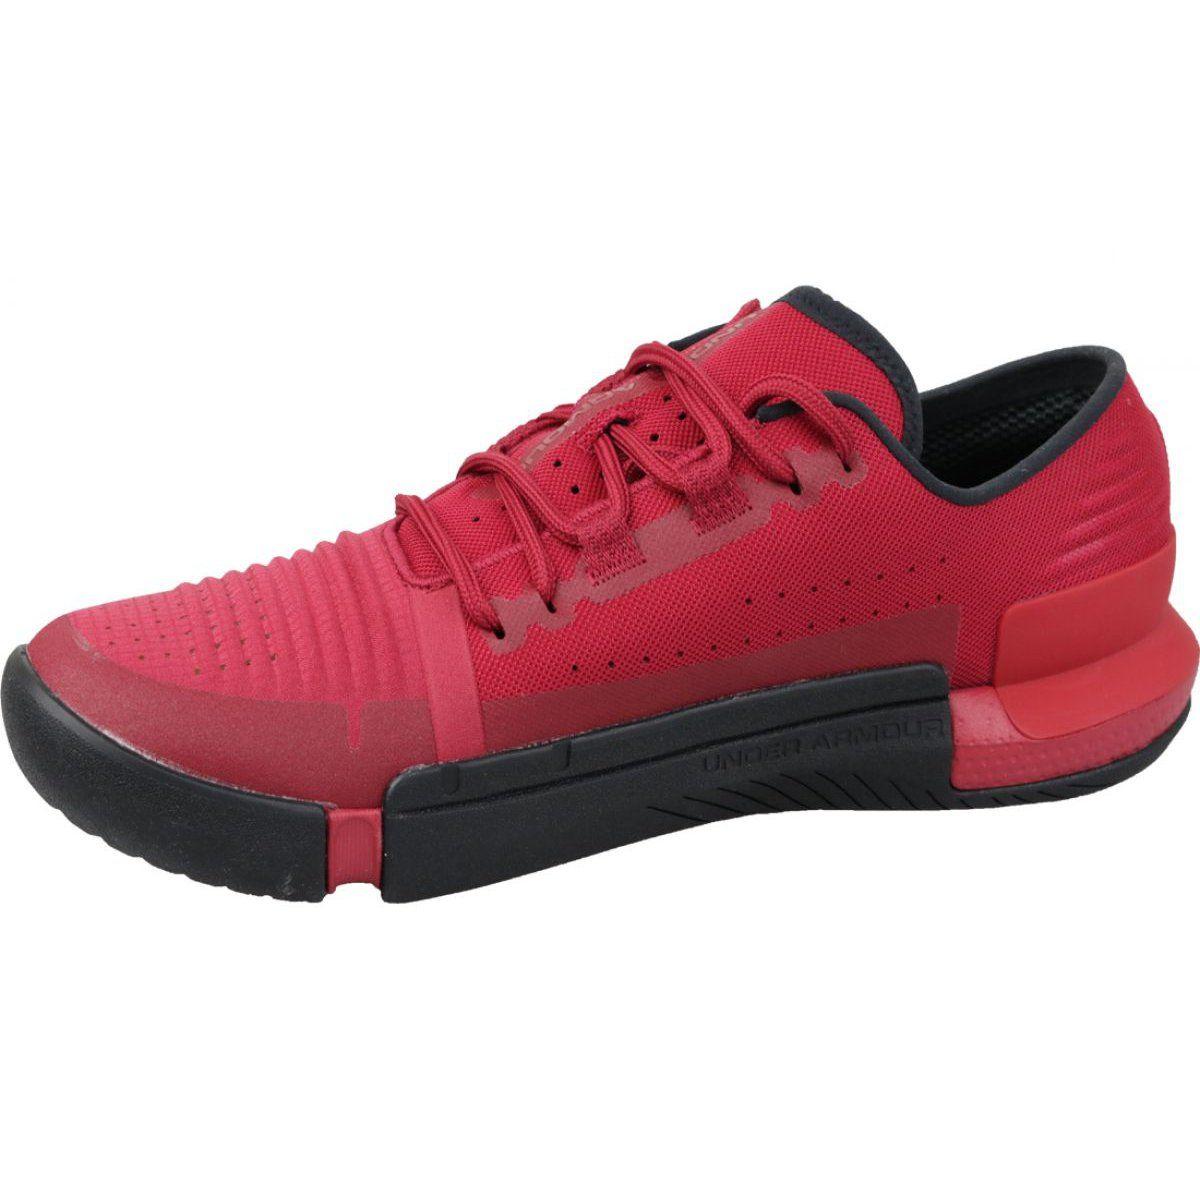 Buty Treningowe Under Armour Tribase Reign M 3021289 600 Czerwone Under Armor Training Shoes Sports Footwear